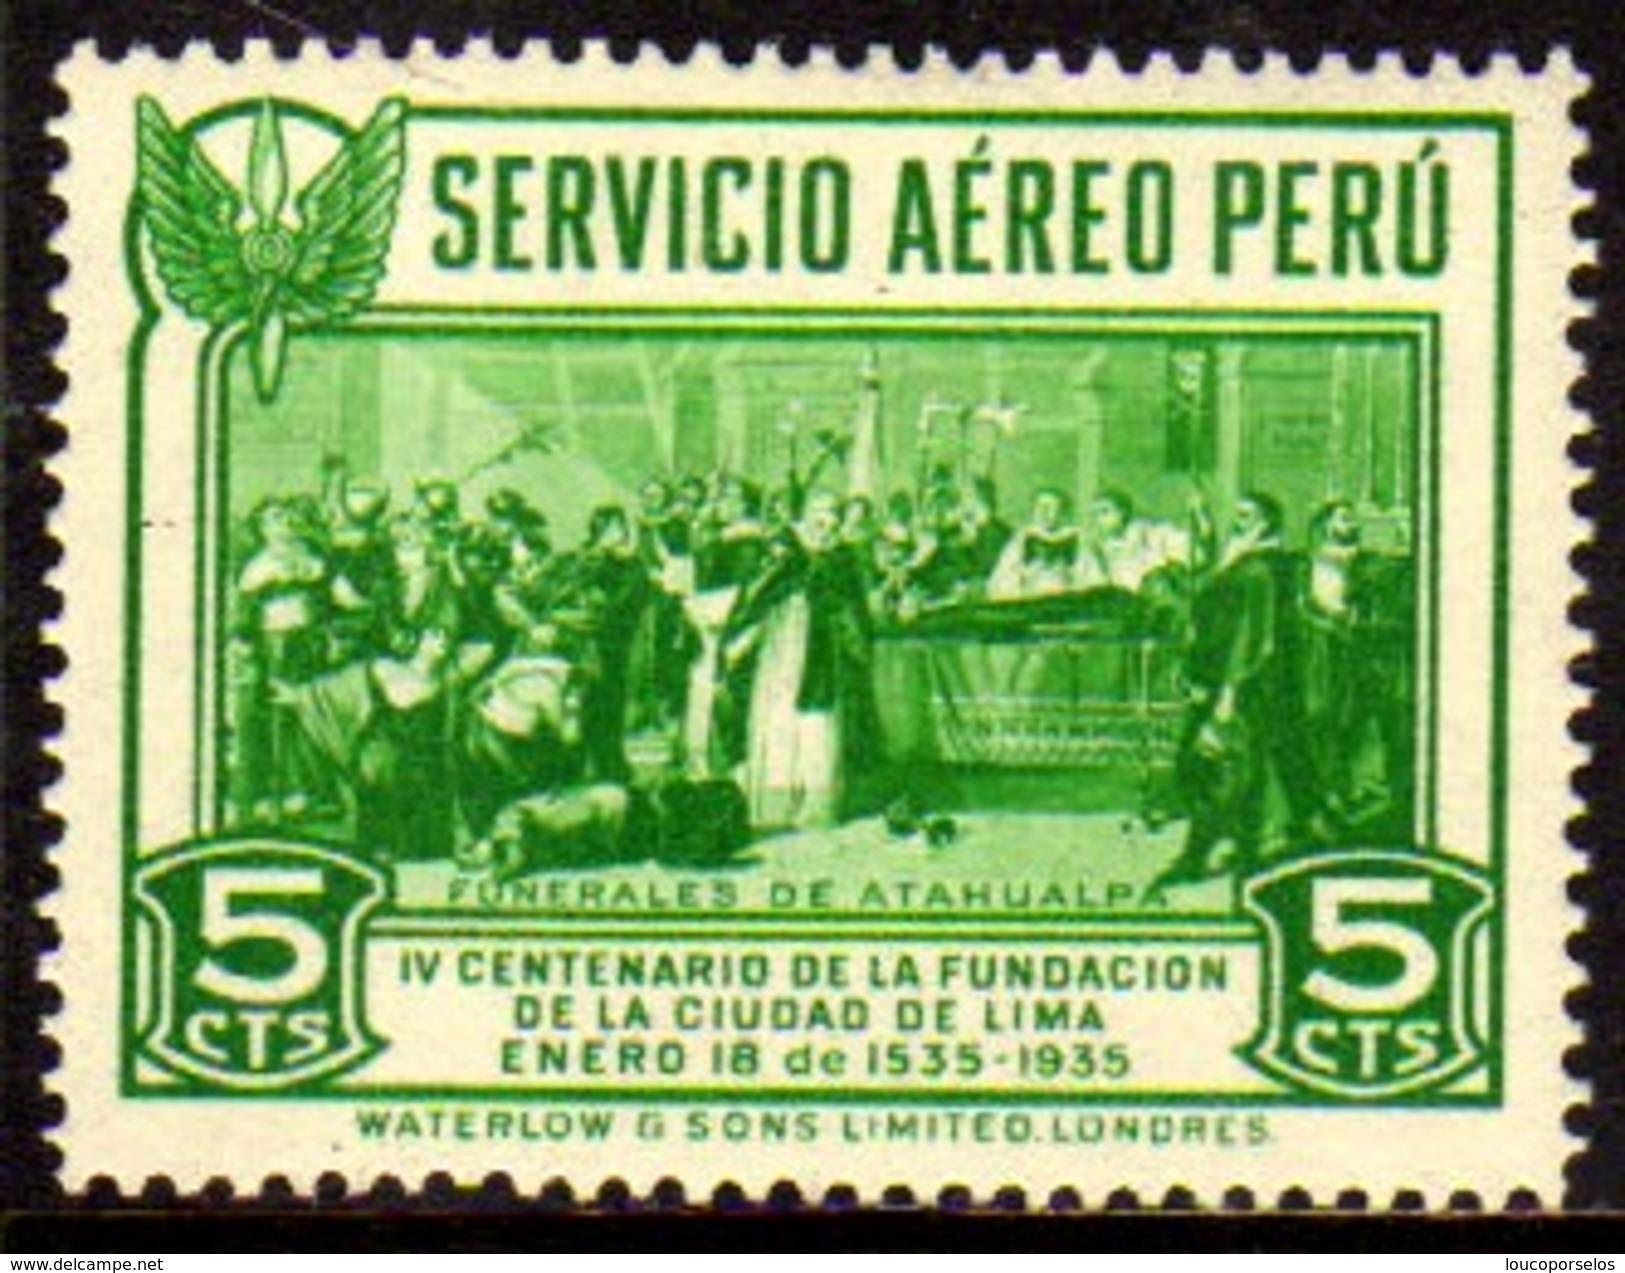 07336 Peru Aéreo 6 Funeral De Atahualpa Nn - Peru